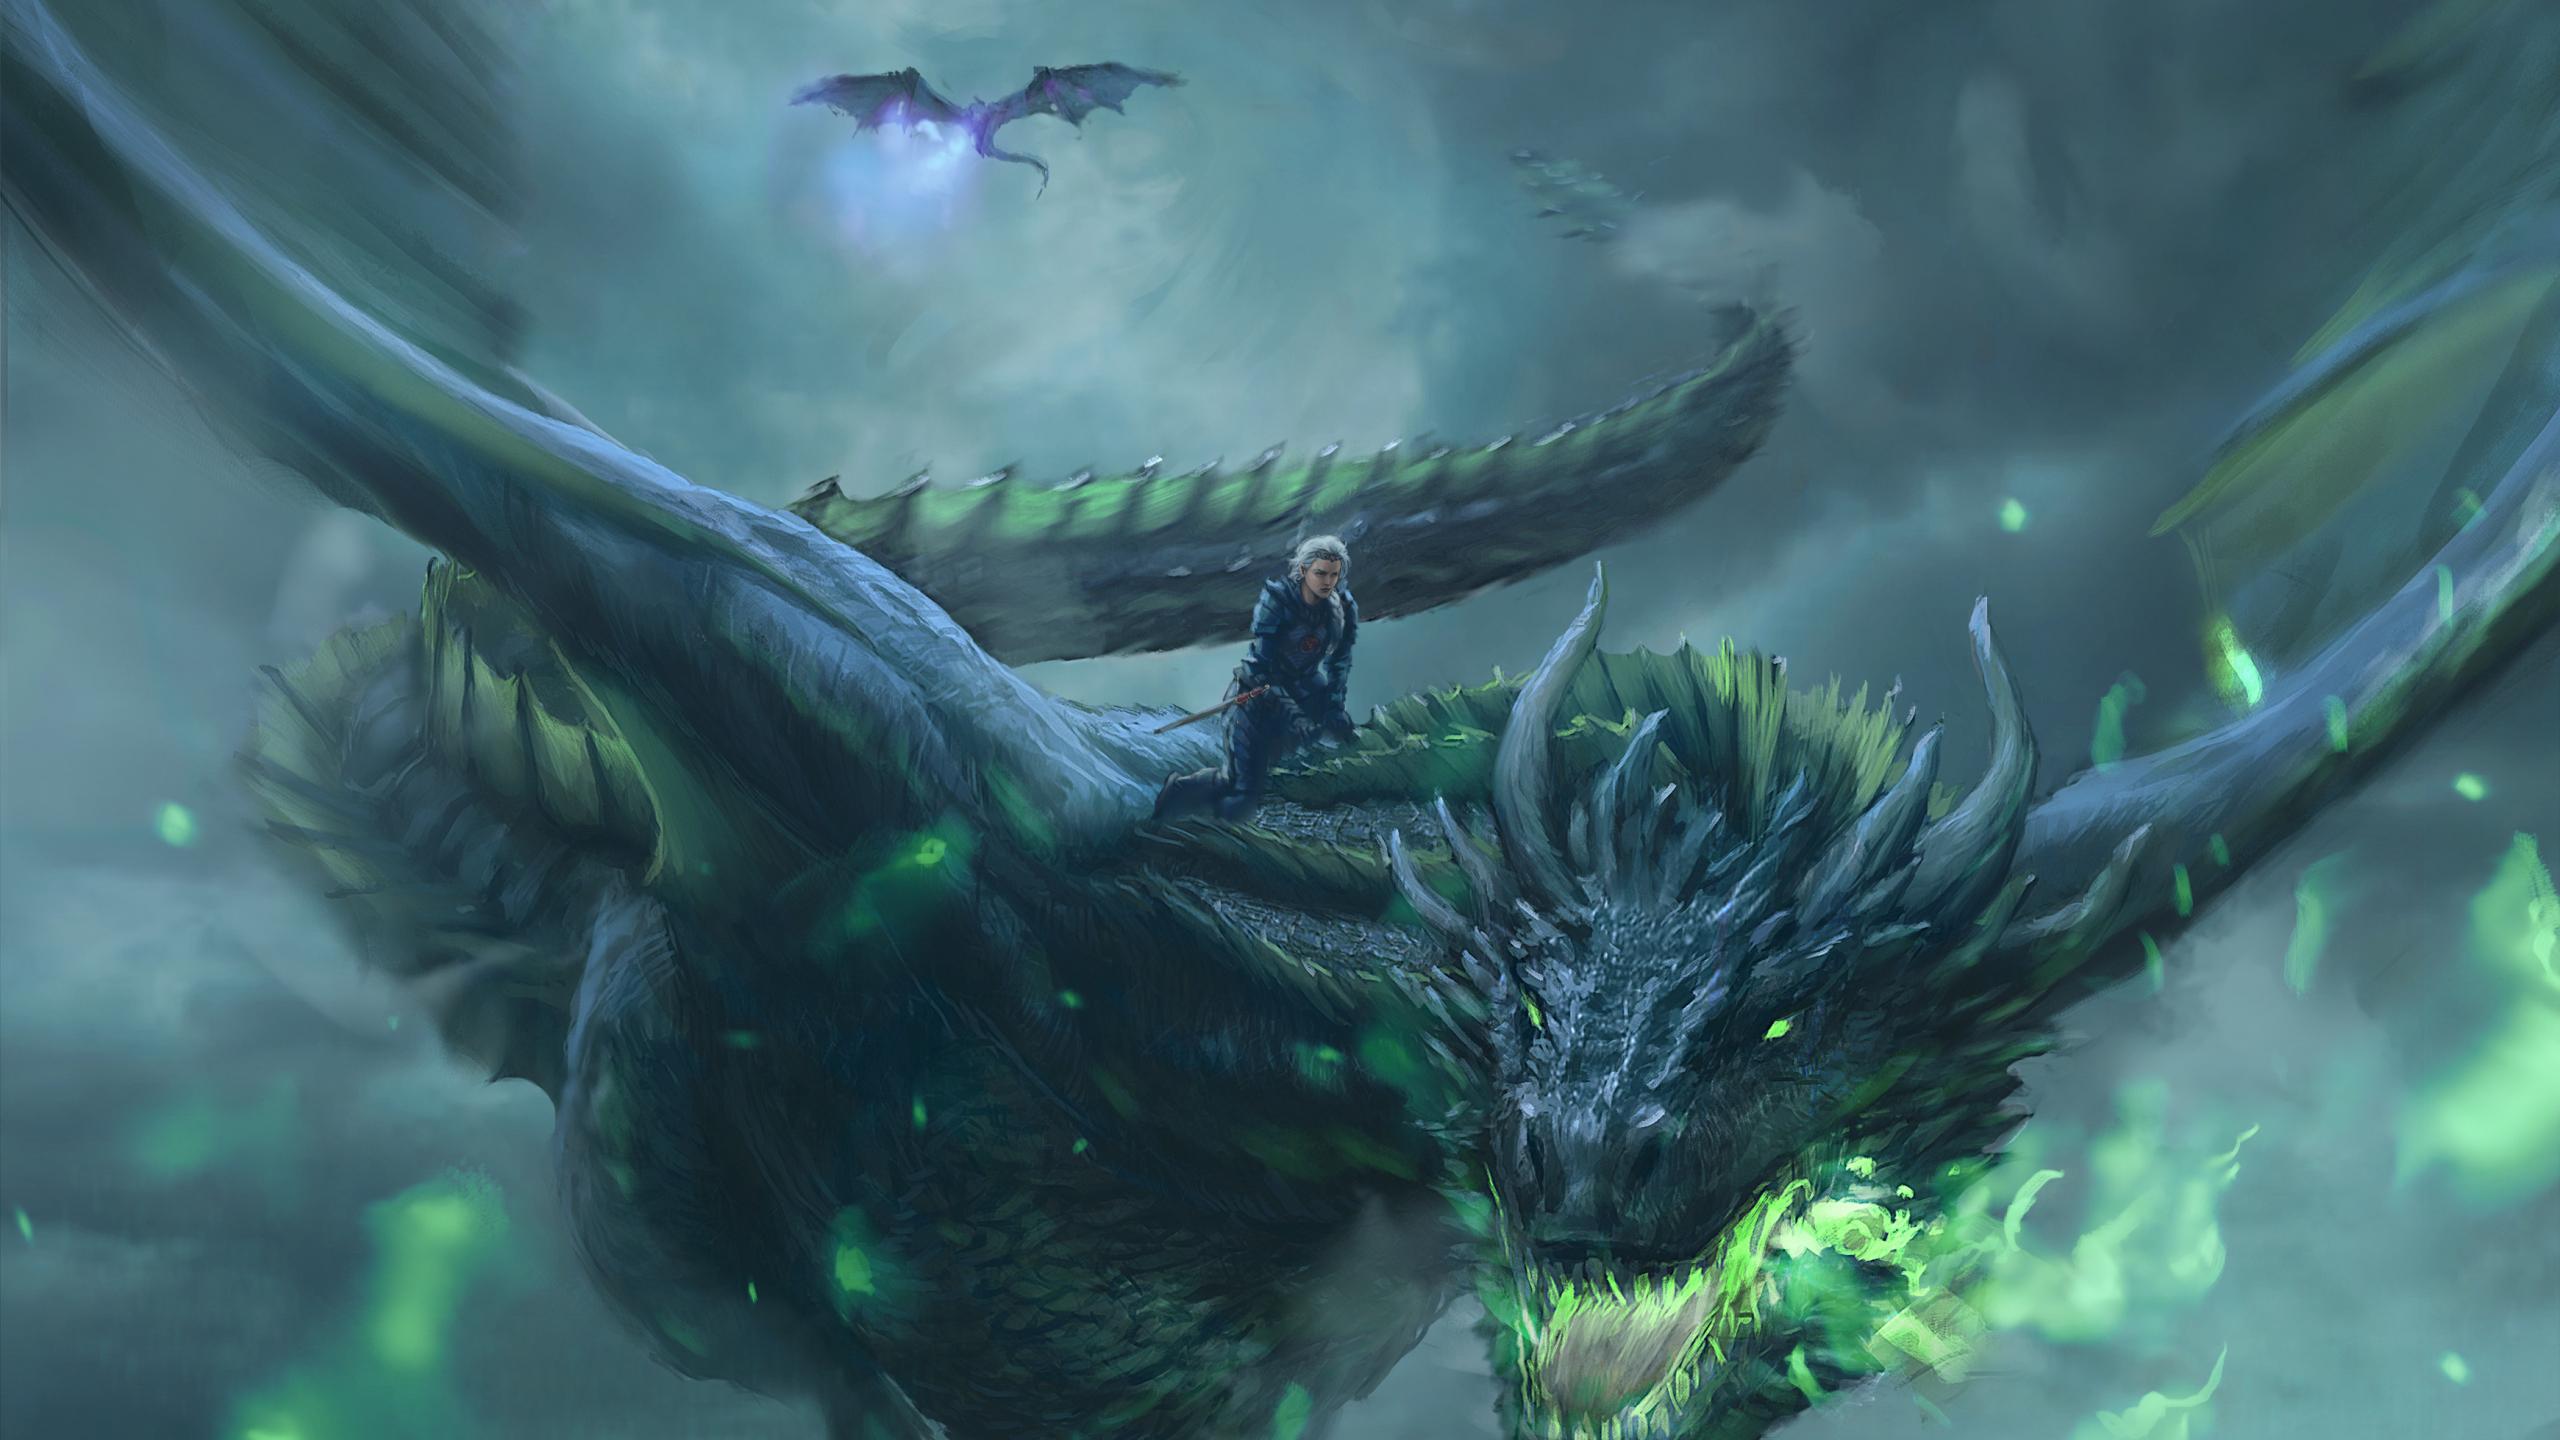 Daenerys Targaryen, Dragon ride, game of thrones, digital art, 2560x1440 wallpaper